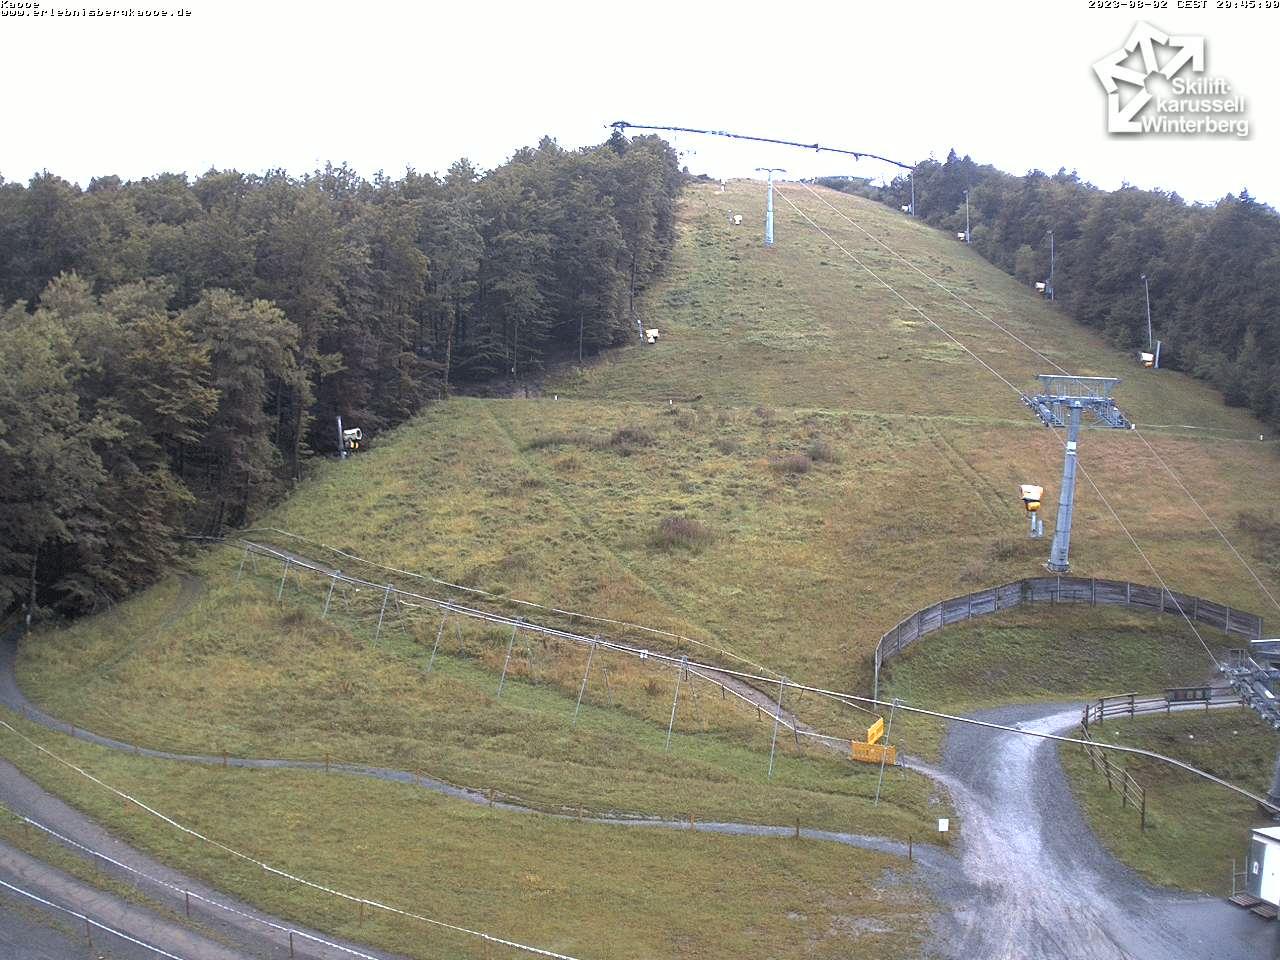 Skiliftkarussell Winterberg - Webcam 9